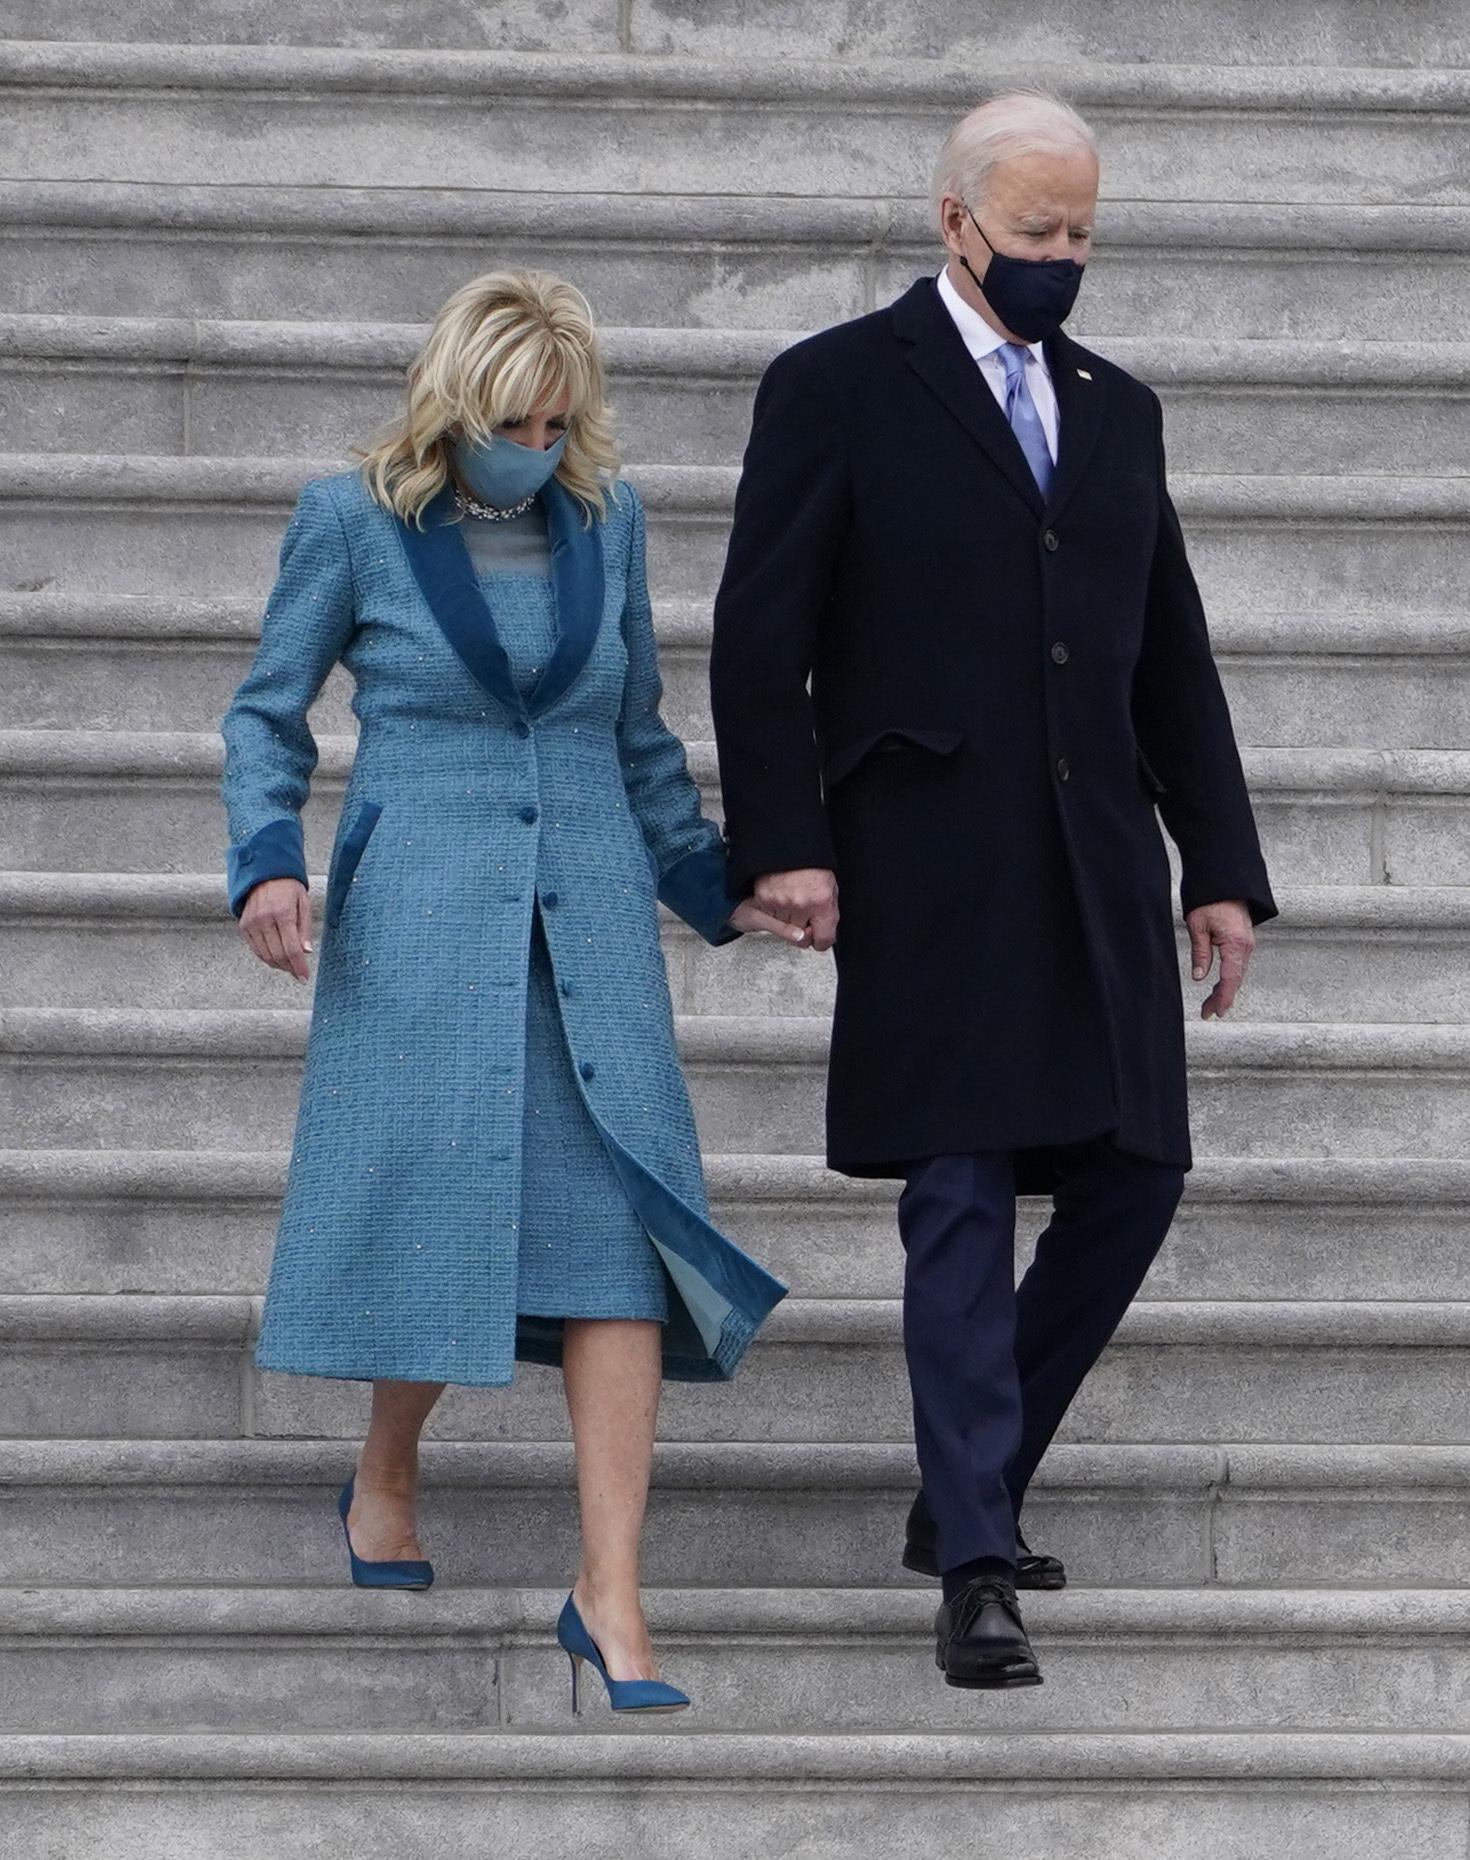 President Joe Biden and First Lady Jill Biden on Inauguration Day 2021